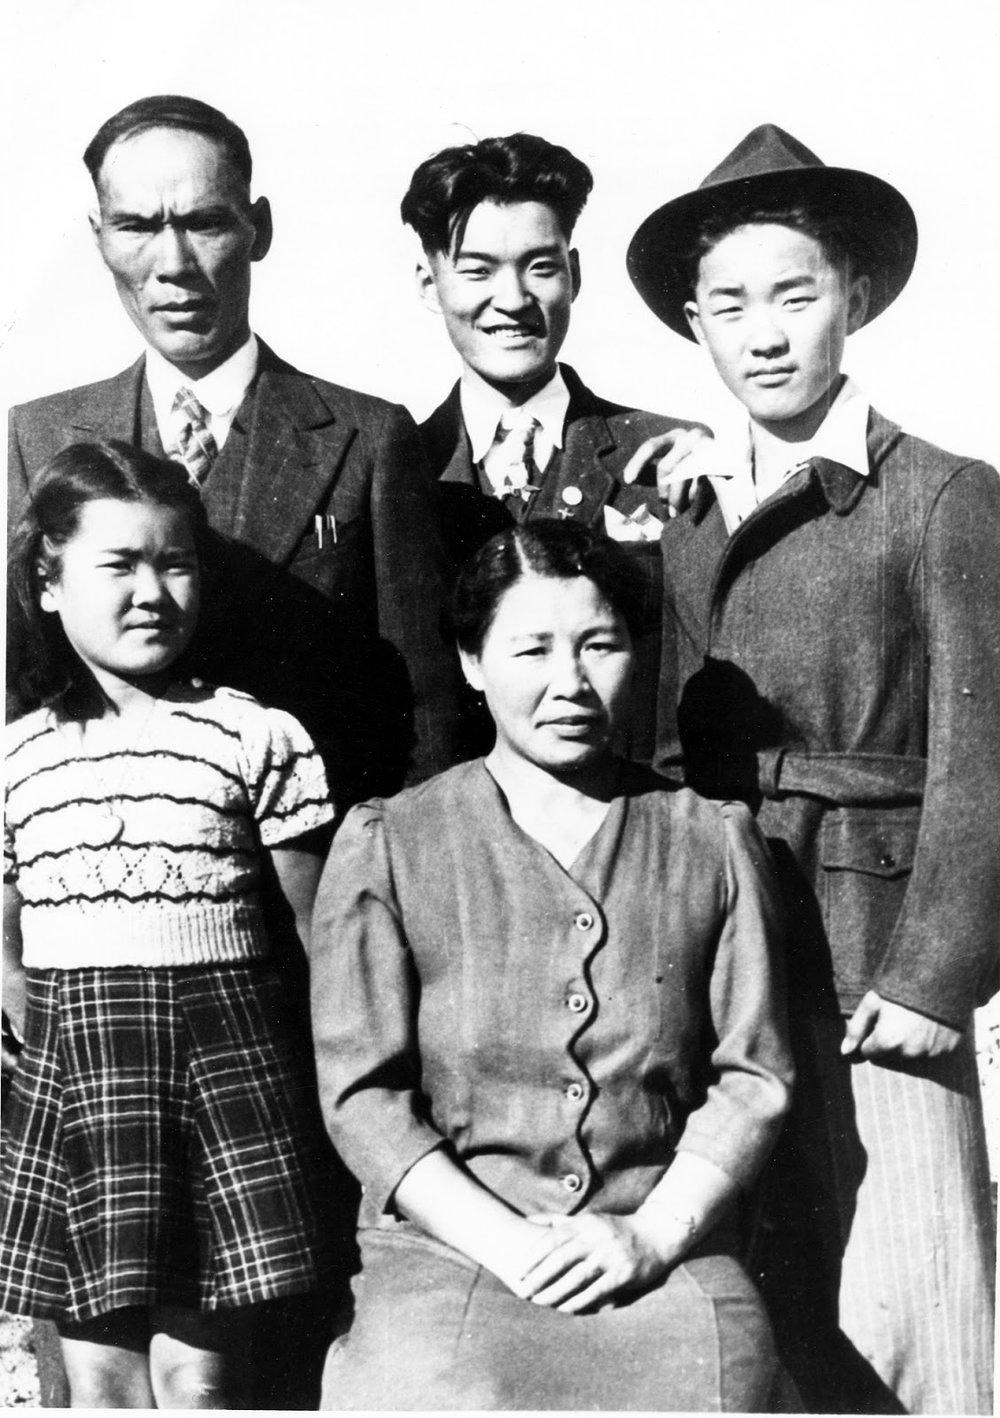 Takeyasu Family, 1943. Galt Archives 19790284003